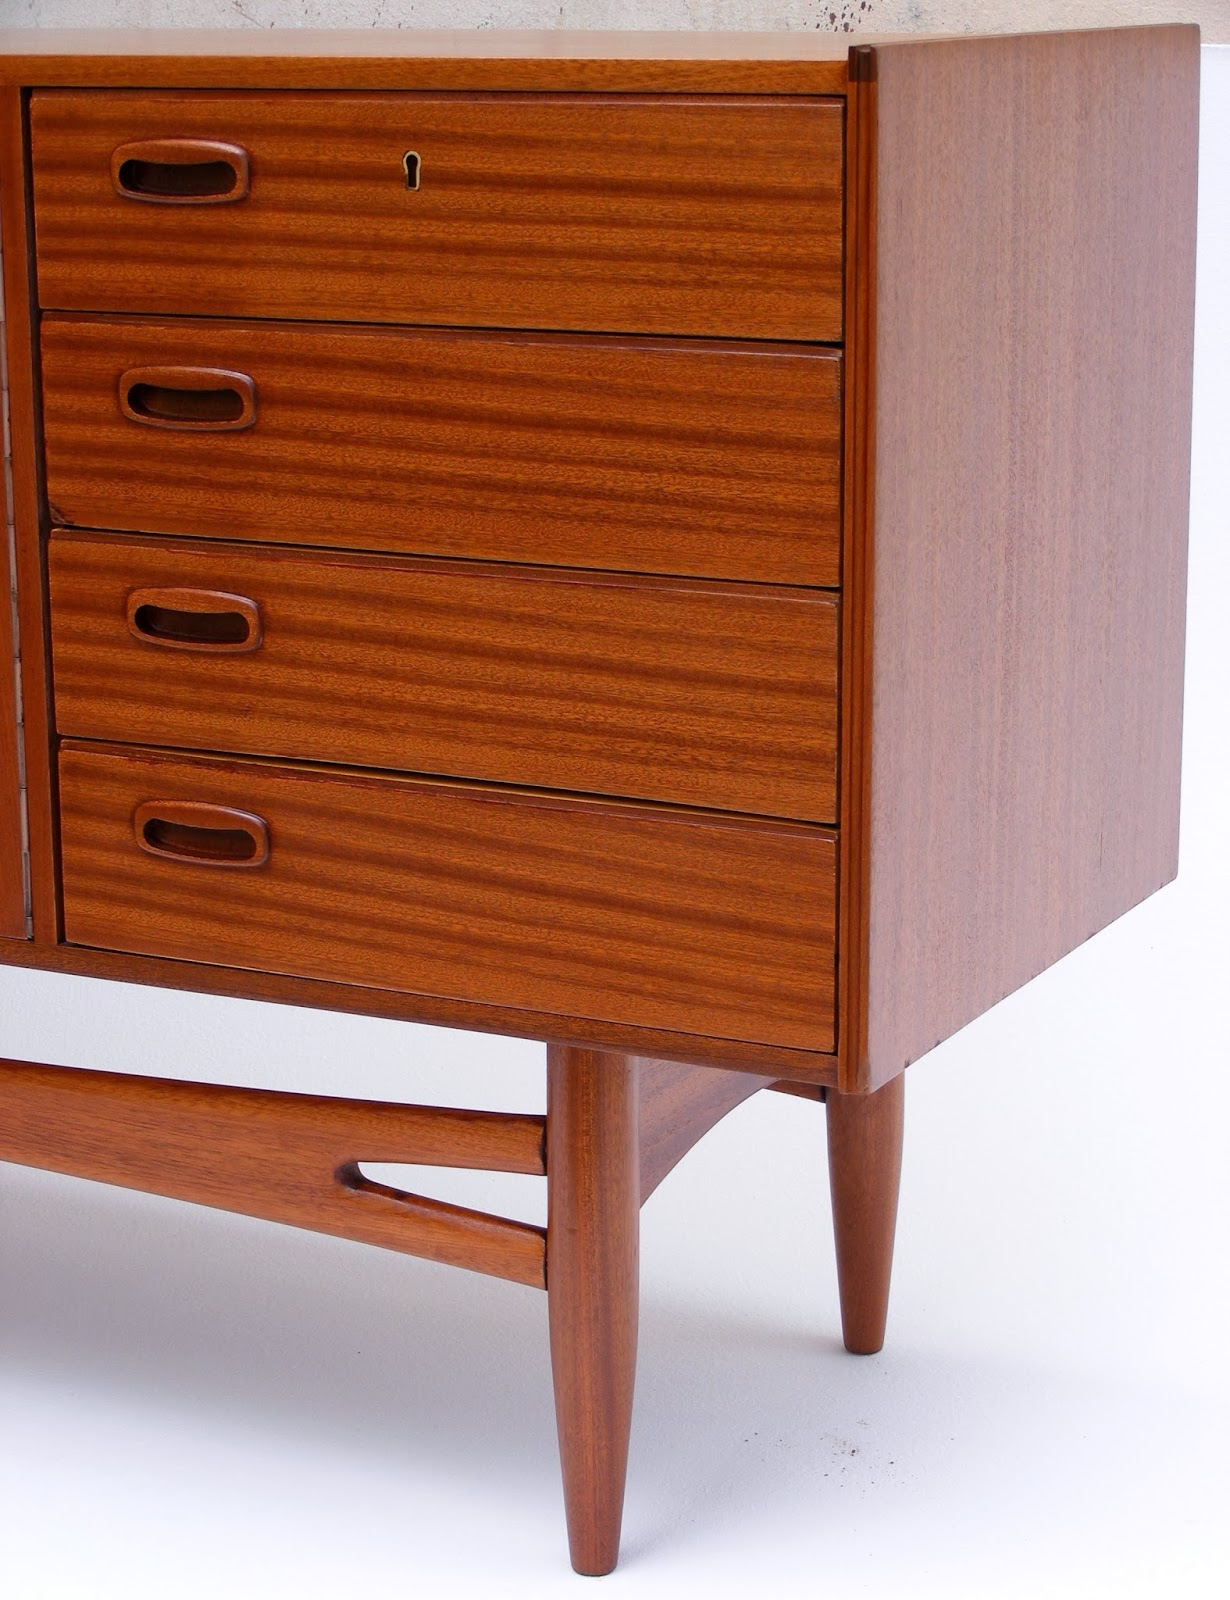 VAMP FURNITURE This weeks new furniture stock 08